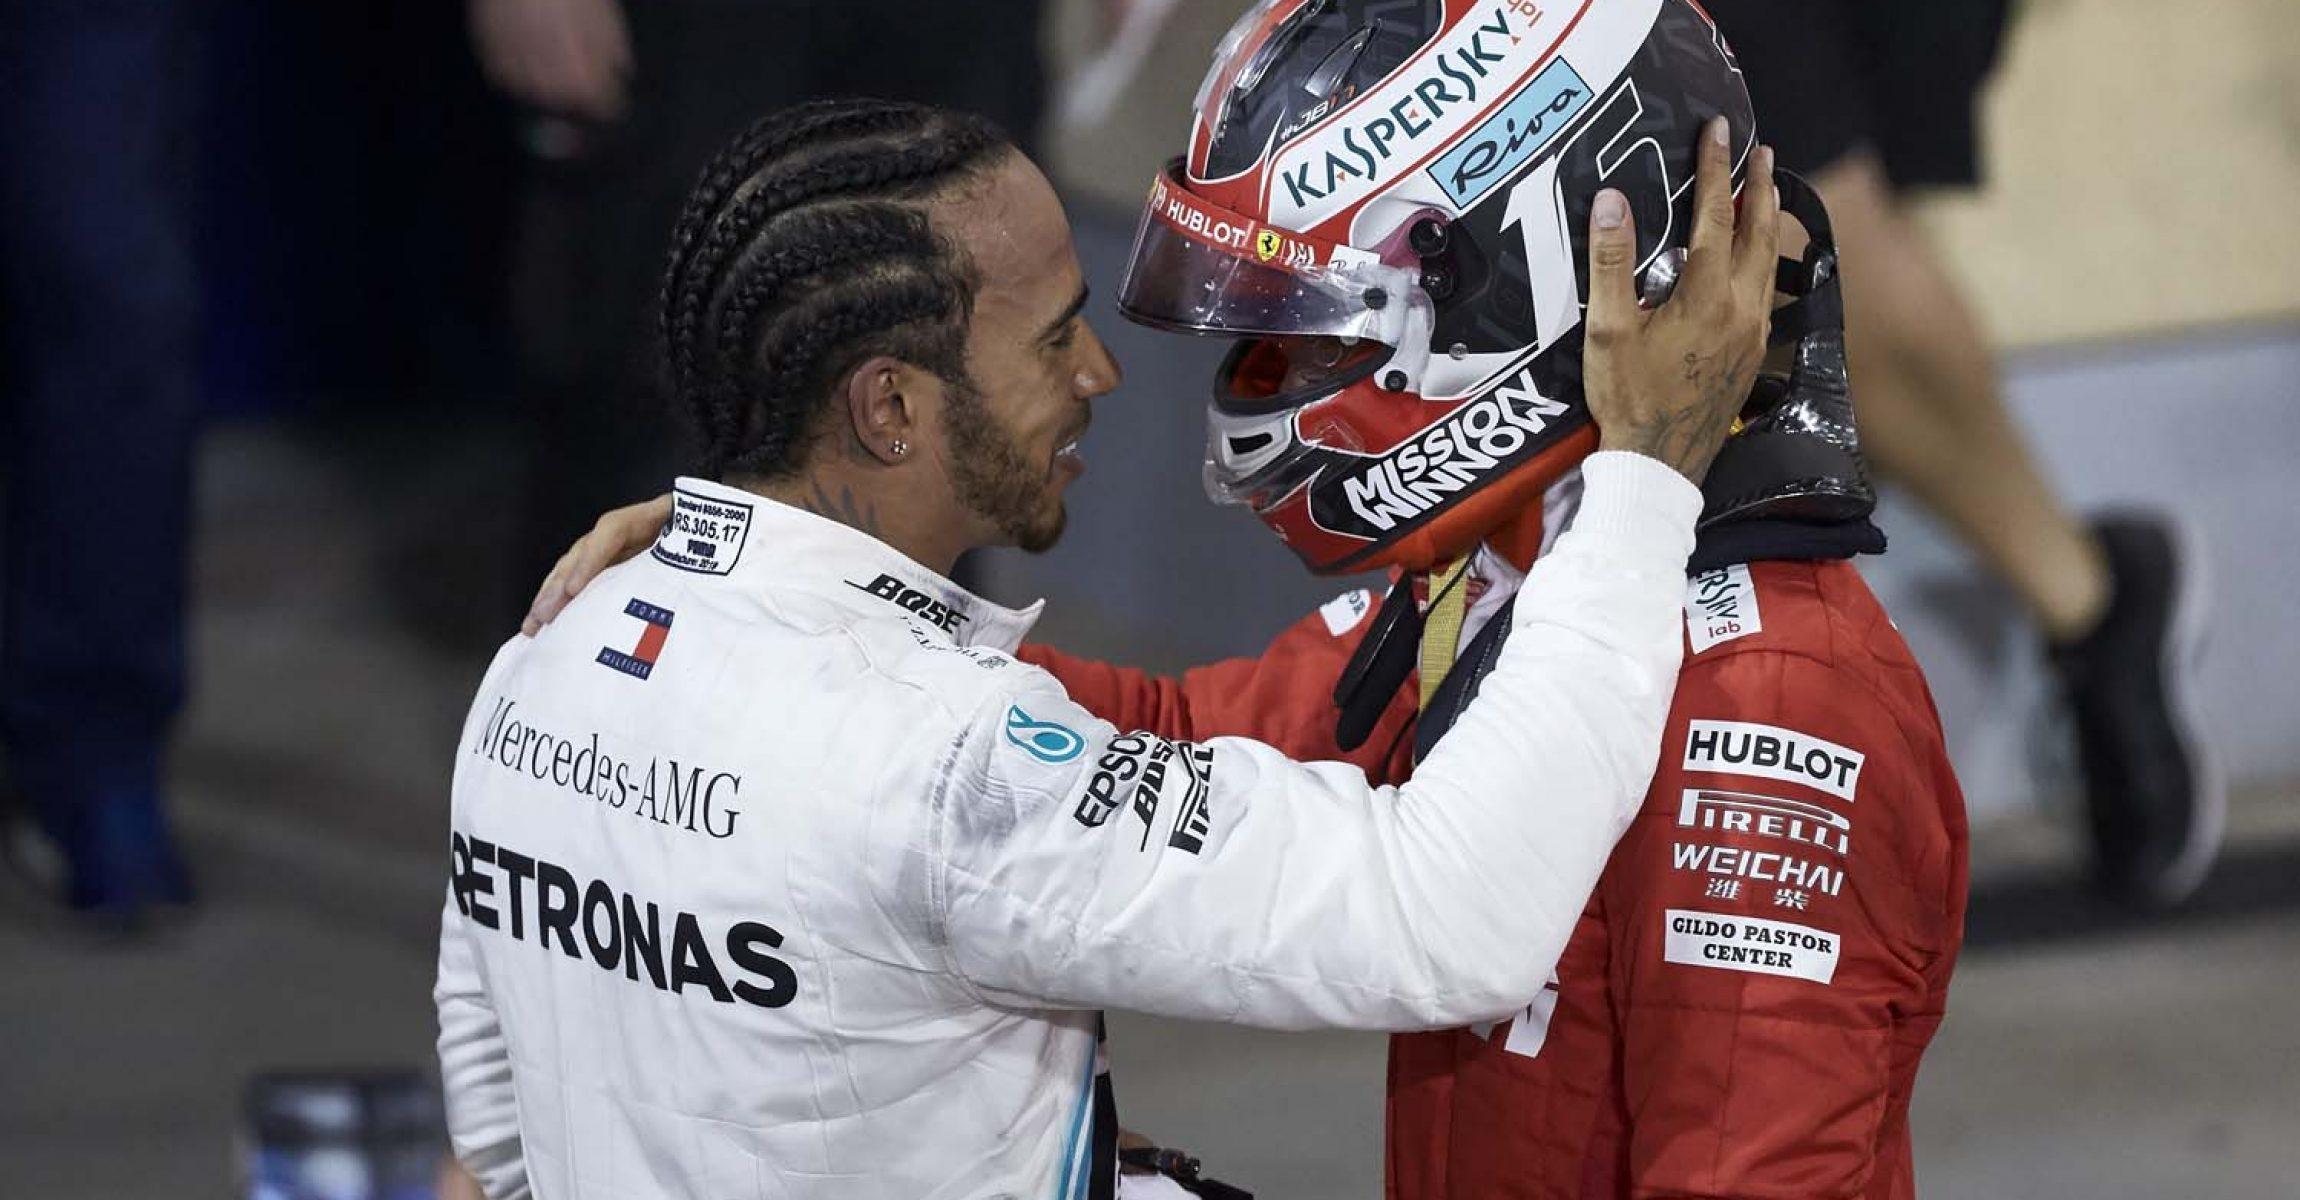 2019 Bahrain Grand Prix, Sunday - Steve Etherington, Lewis Hamilton, Charles Leclerc